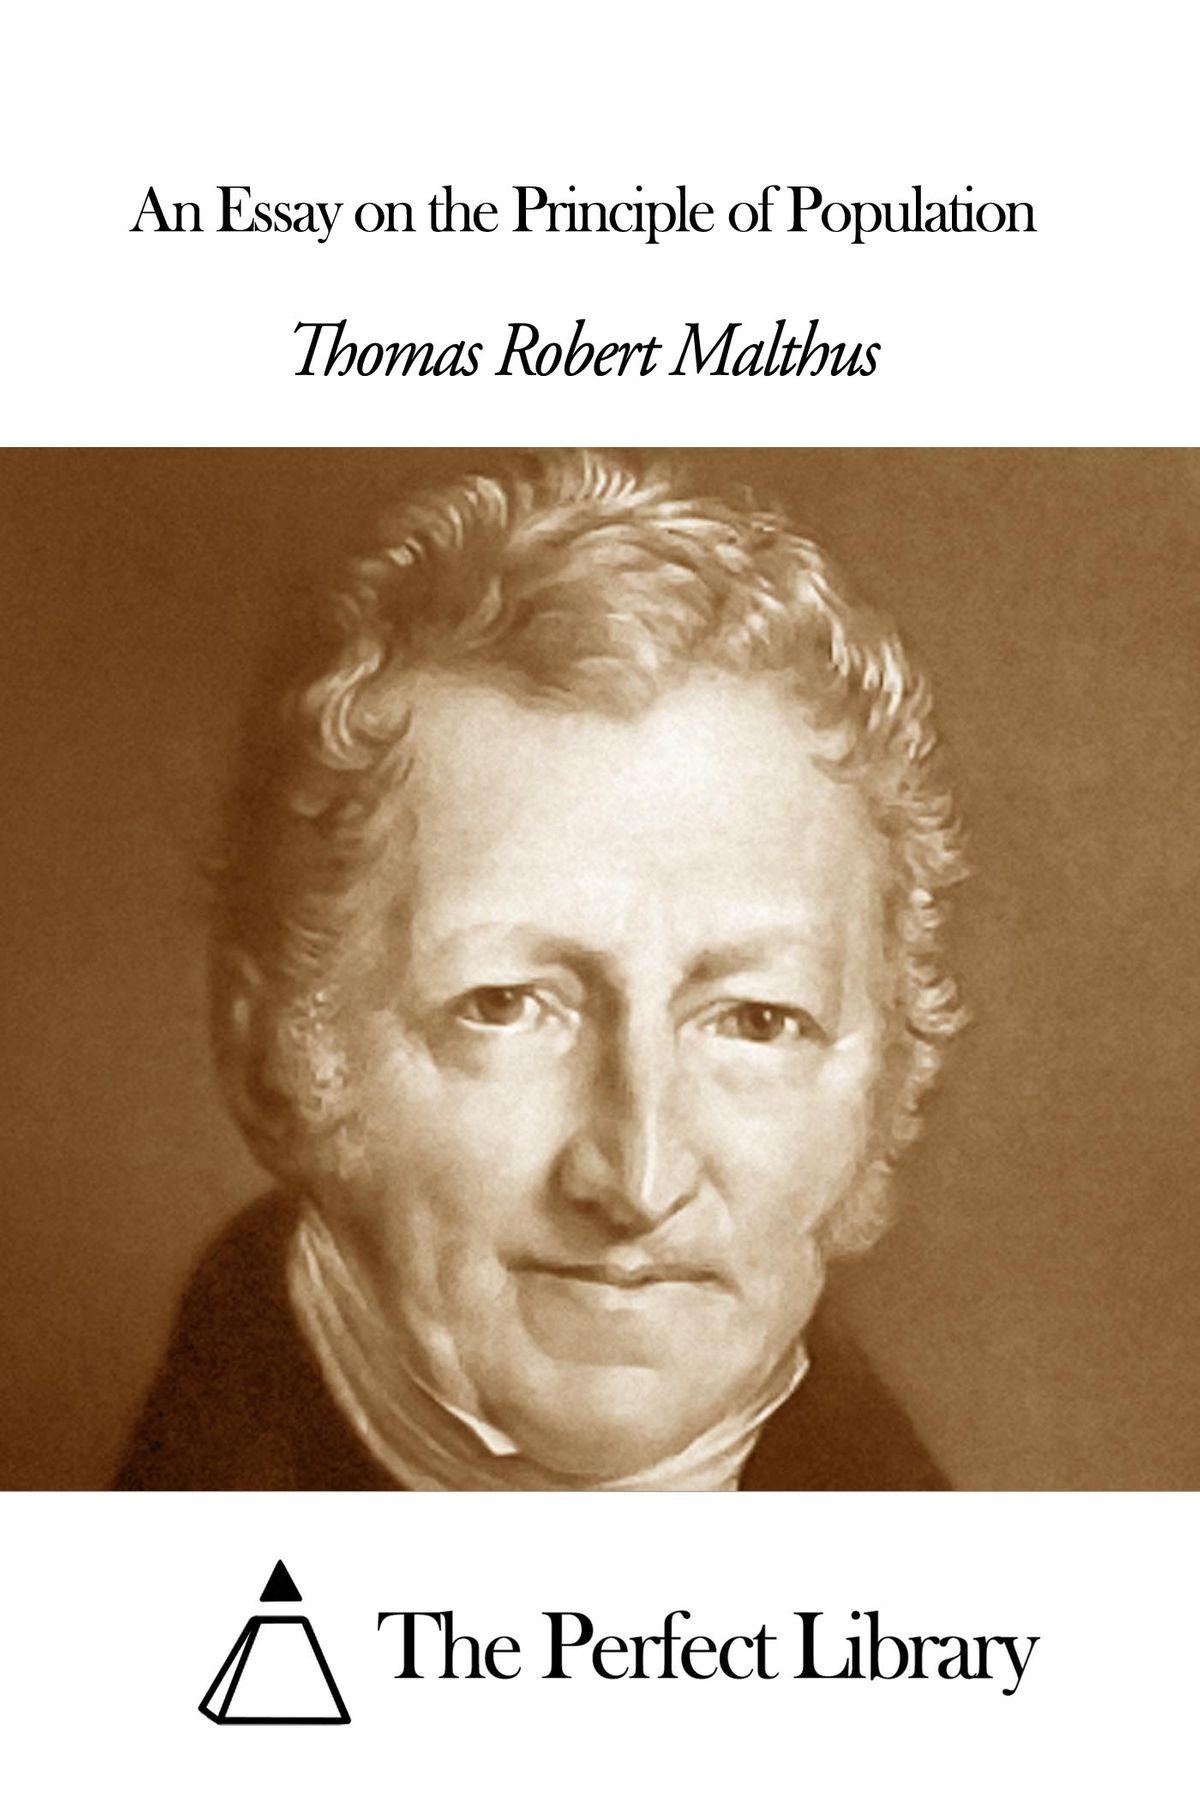 016 Essay Example On The Principle Of Population An Singular Pdf By Thomas Malthus Main Idea Full